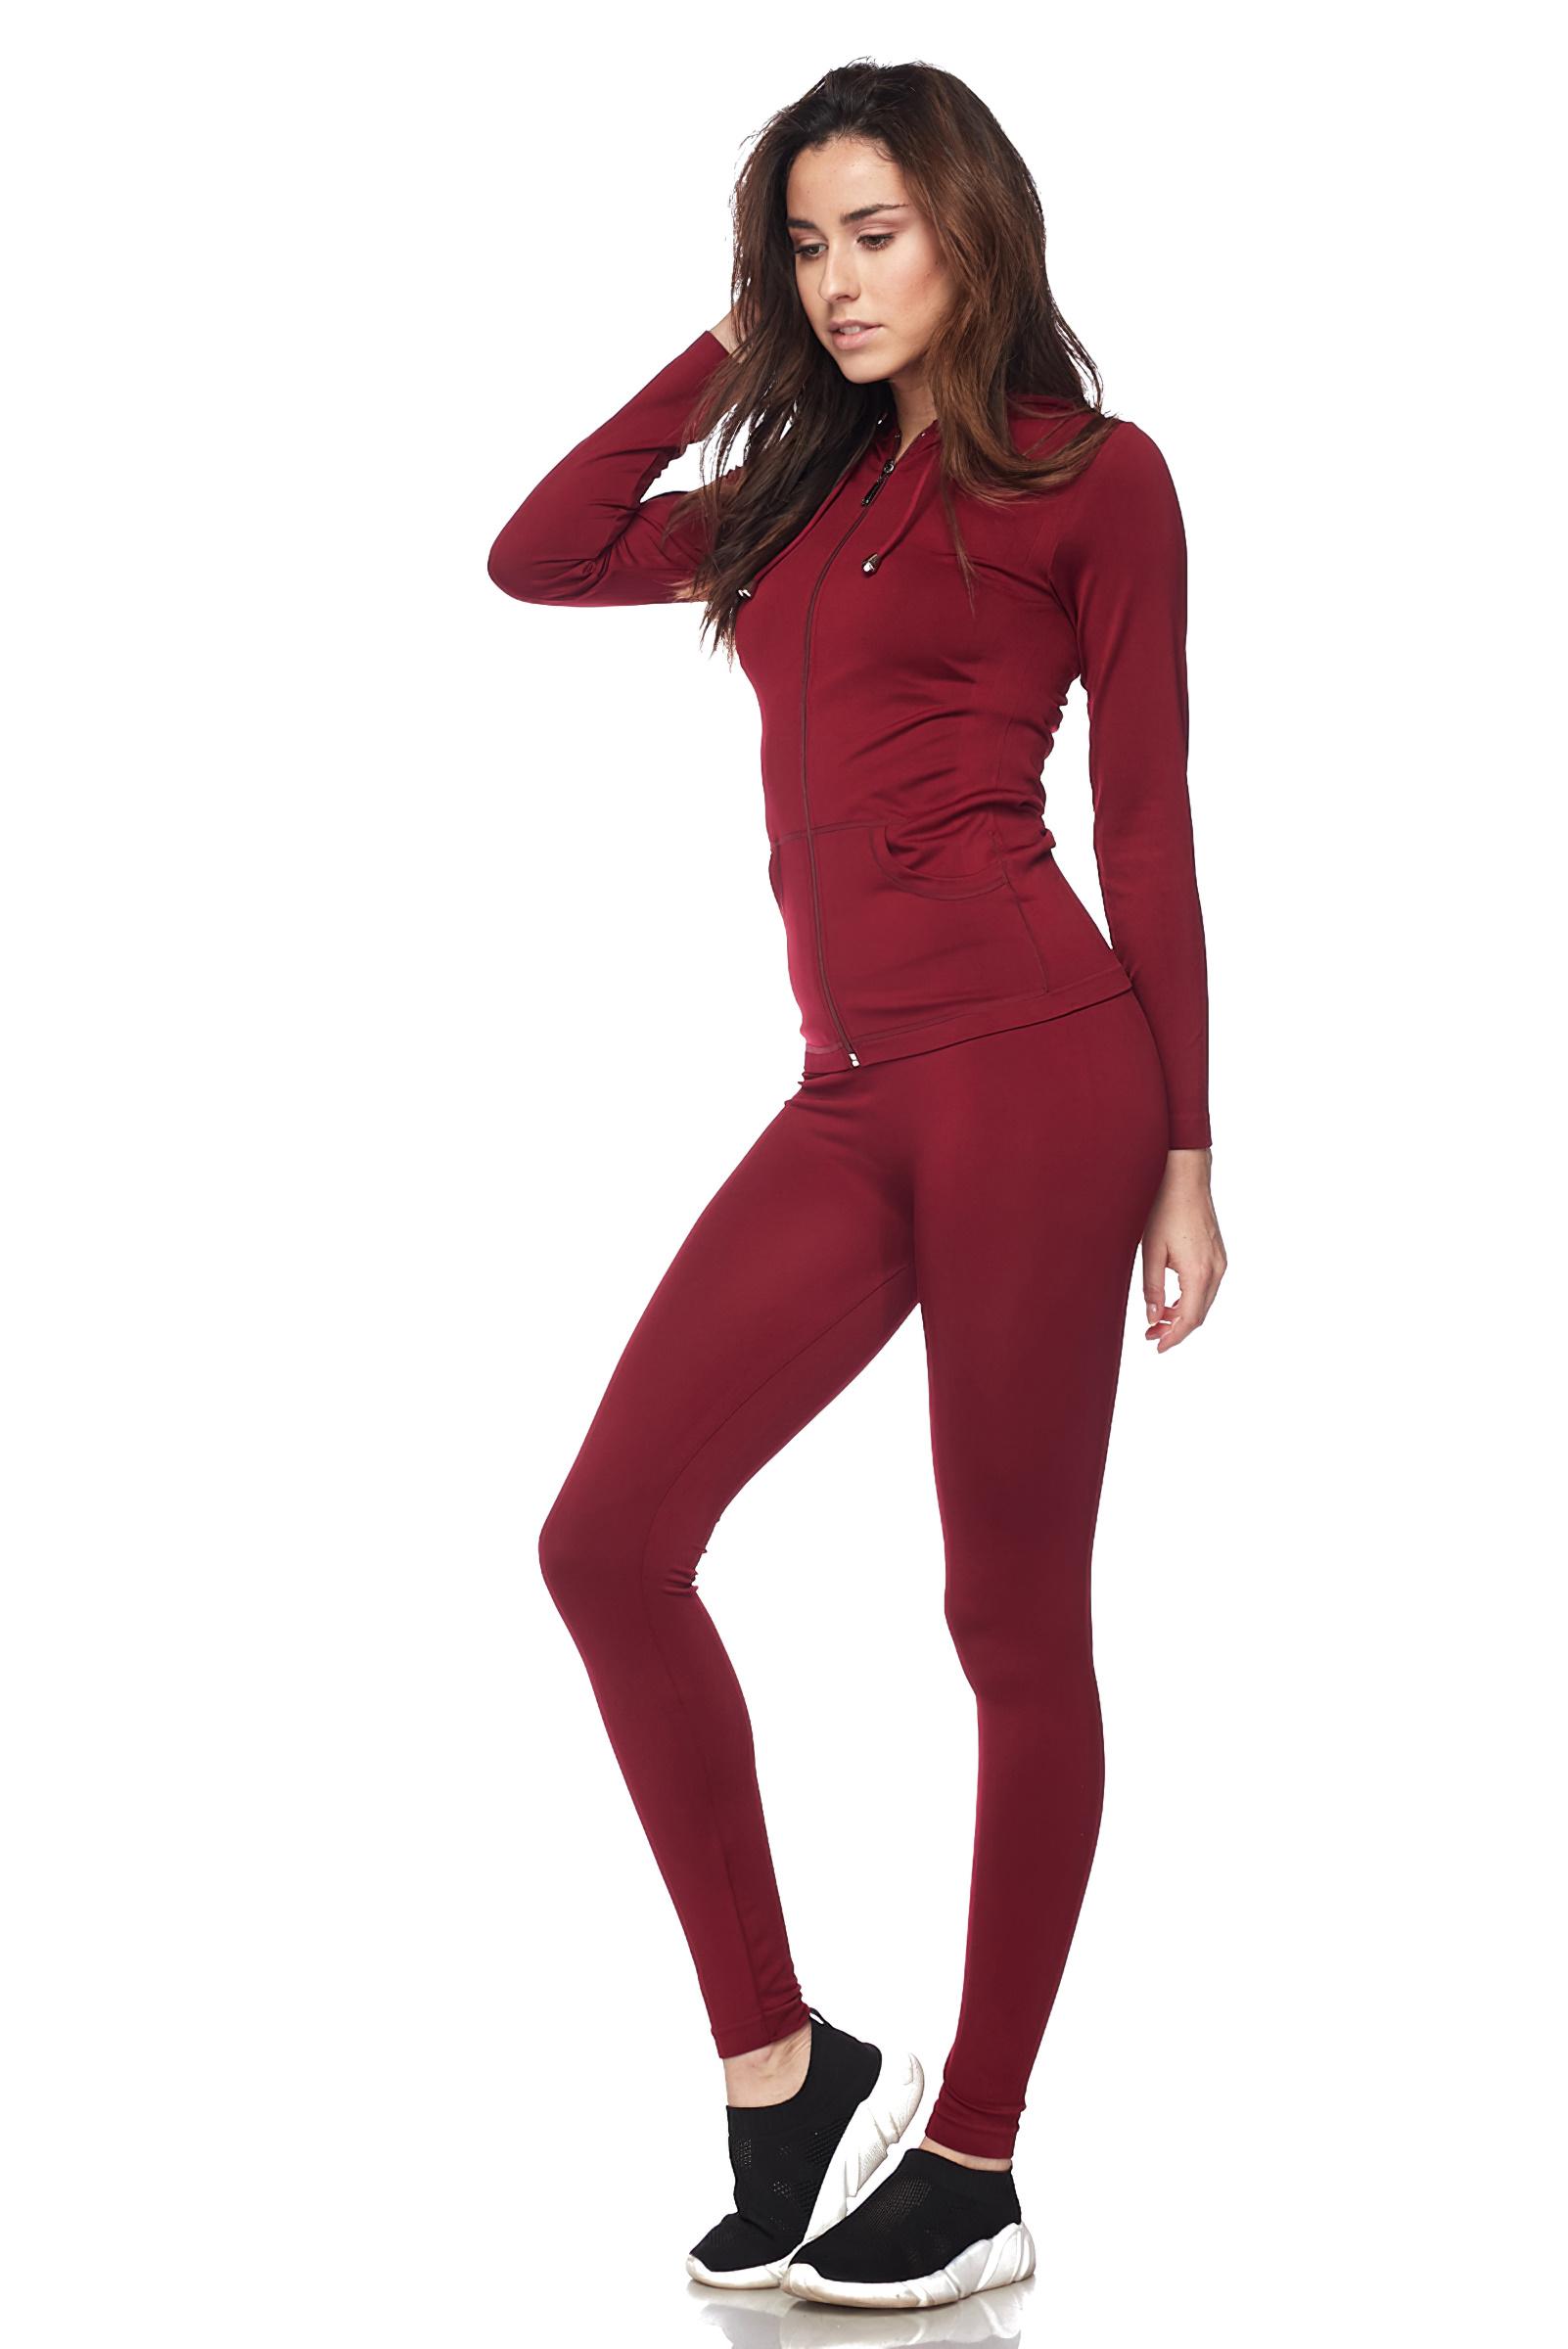 Women-039-s-Juniors-Active-Set-Wear-Zip-Up-Hoodie-and-Legging thumbnail 16